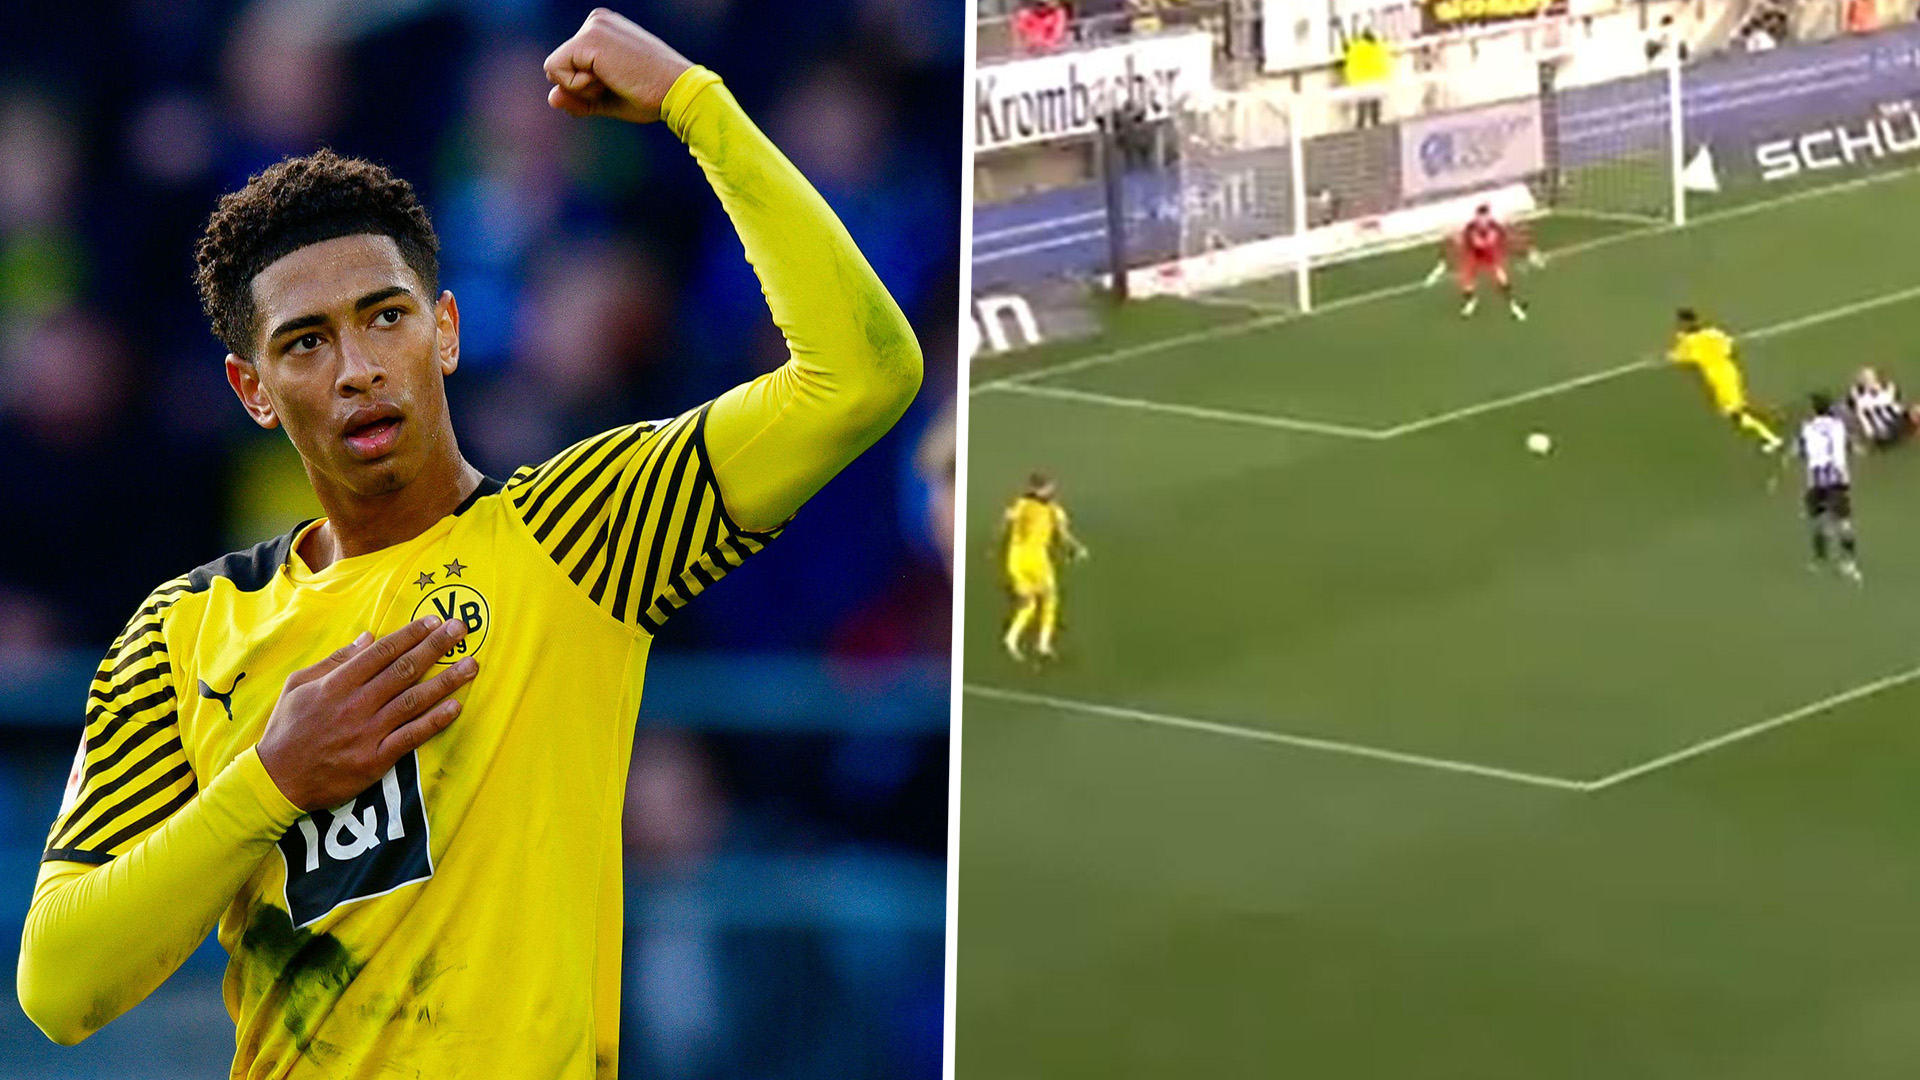 Video: Watch Bellingham score Messi-esque wonder goal for Dortmund